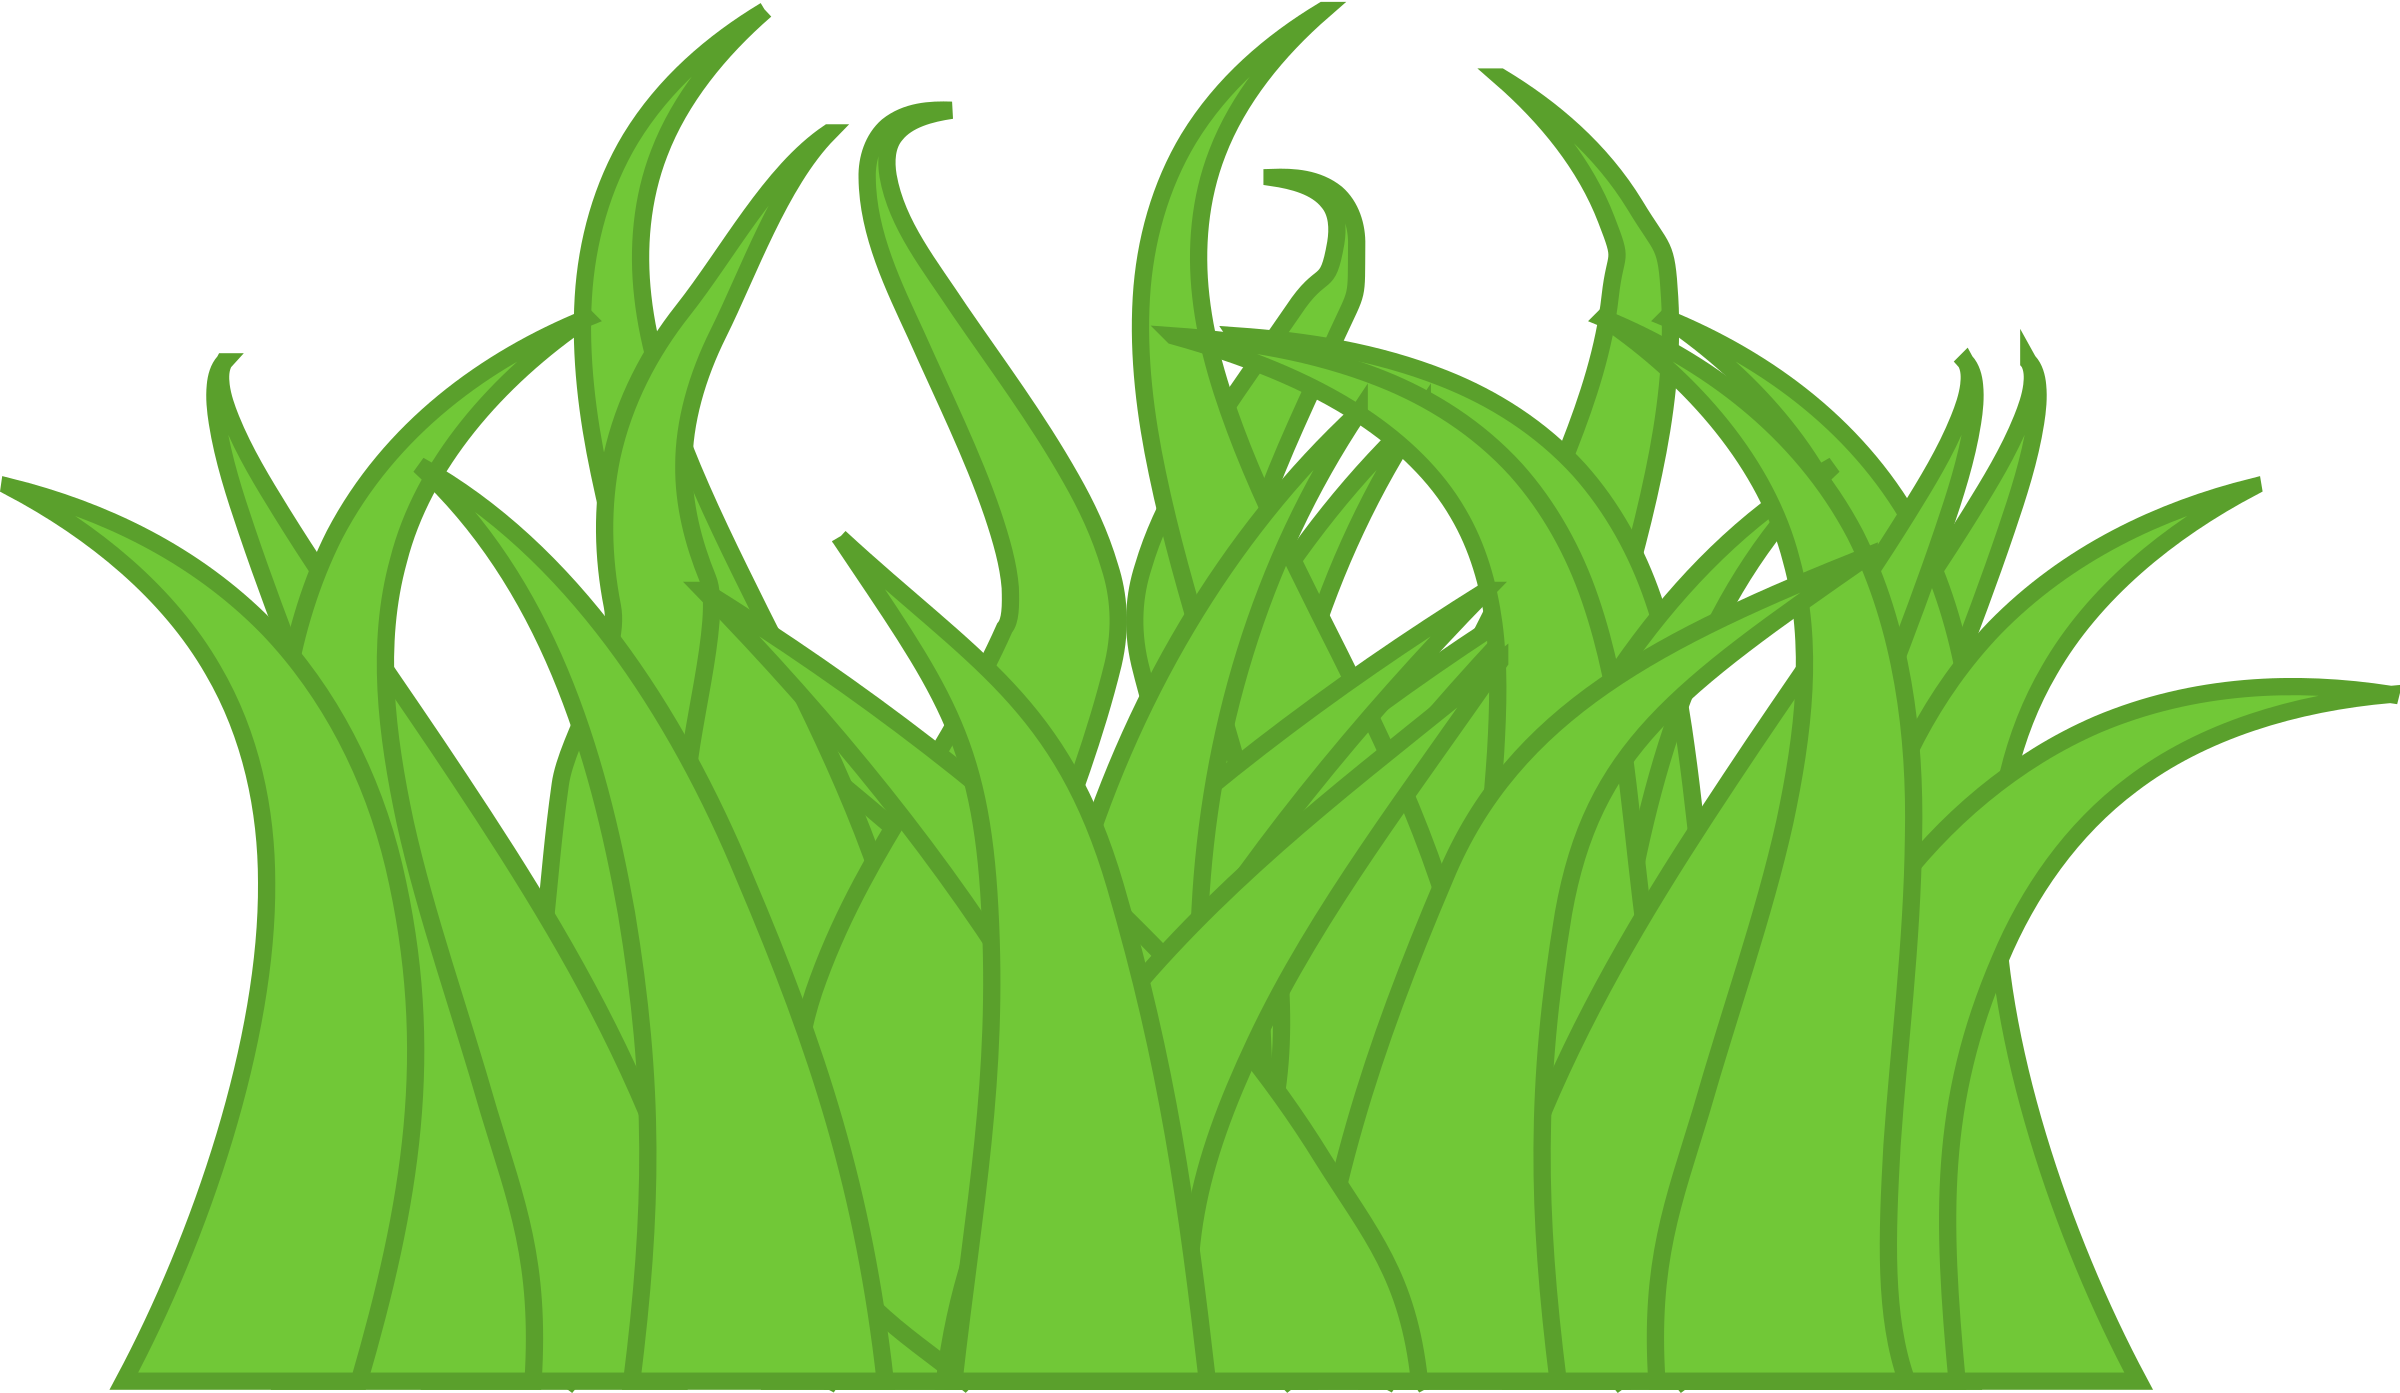 Grass vector clipart clip freeuse stock Grass Vector Clipart image - Free stock photo - Public Domain photo ... clip freeuse stock